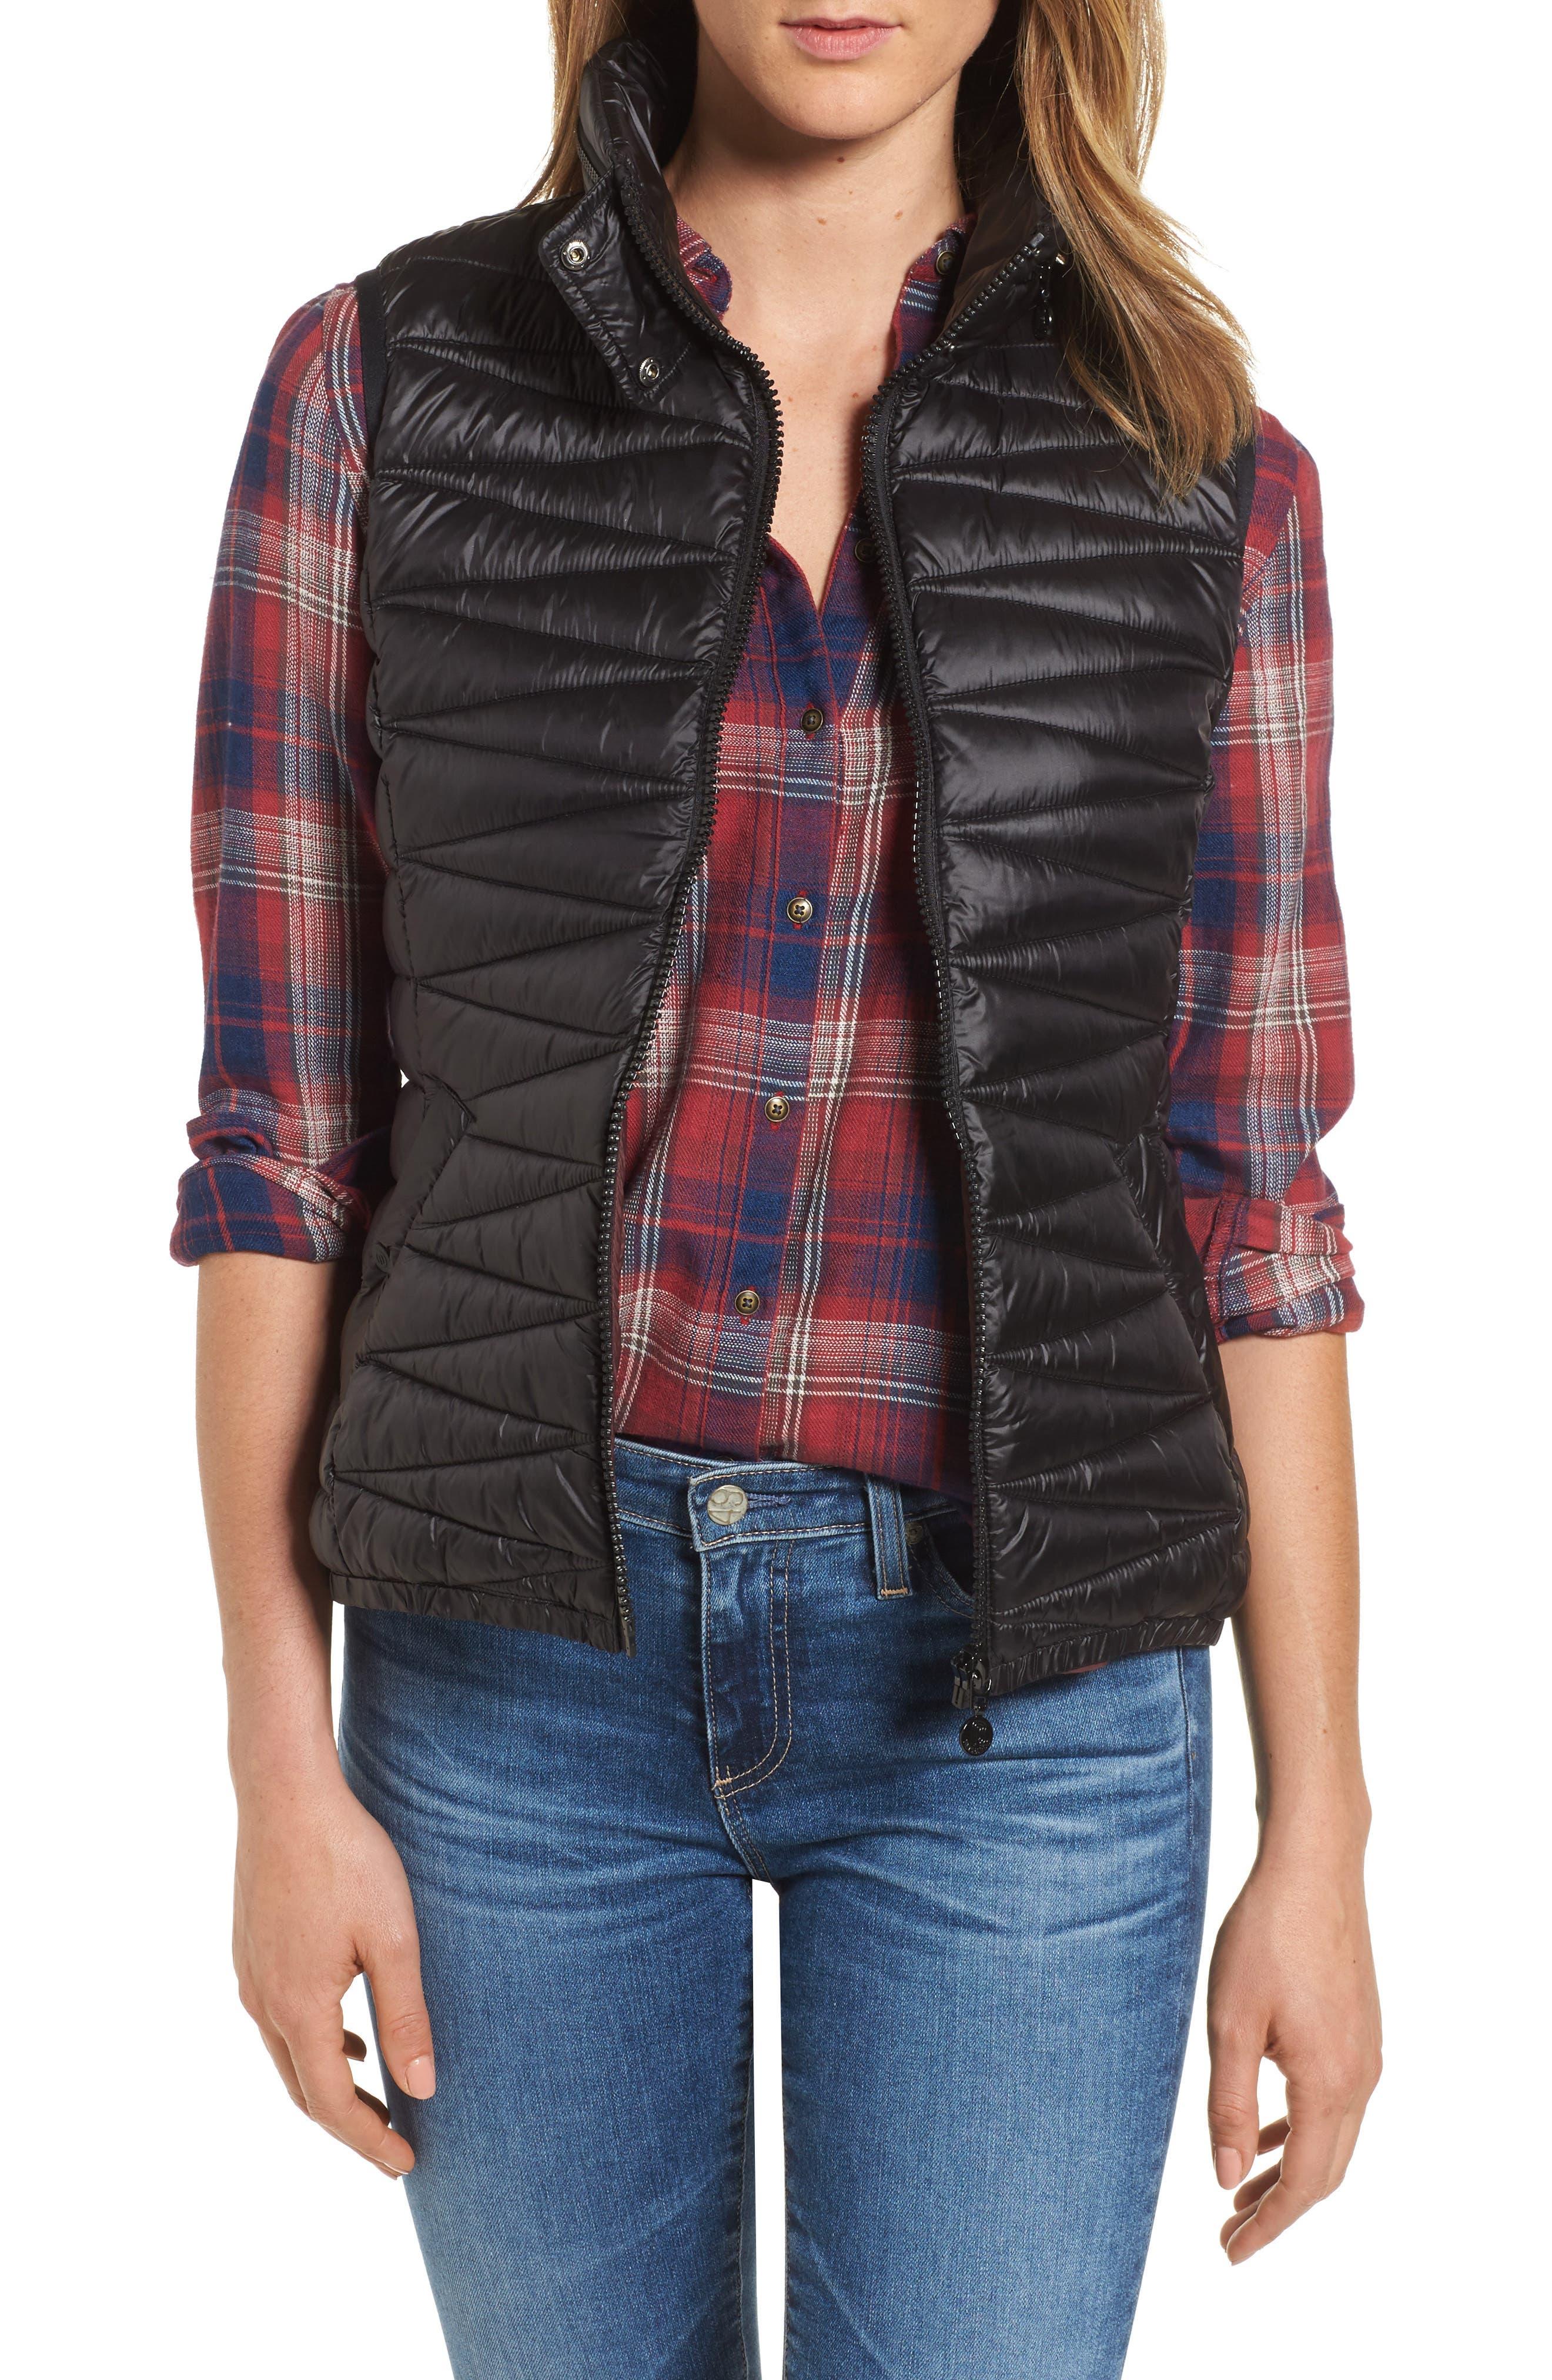 Alternate Image 1 Selected - Bernardo Packable Vest